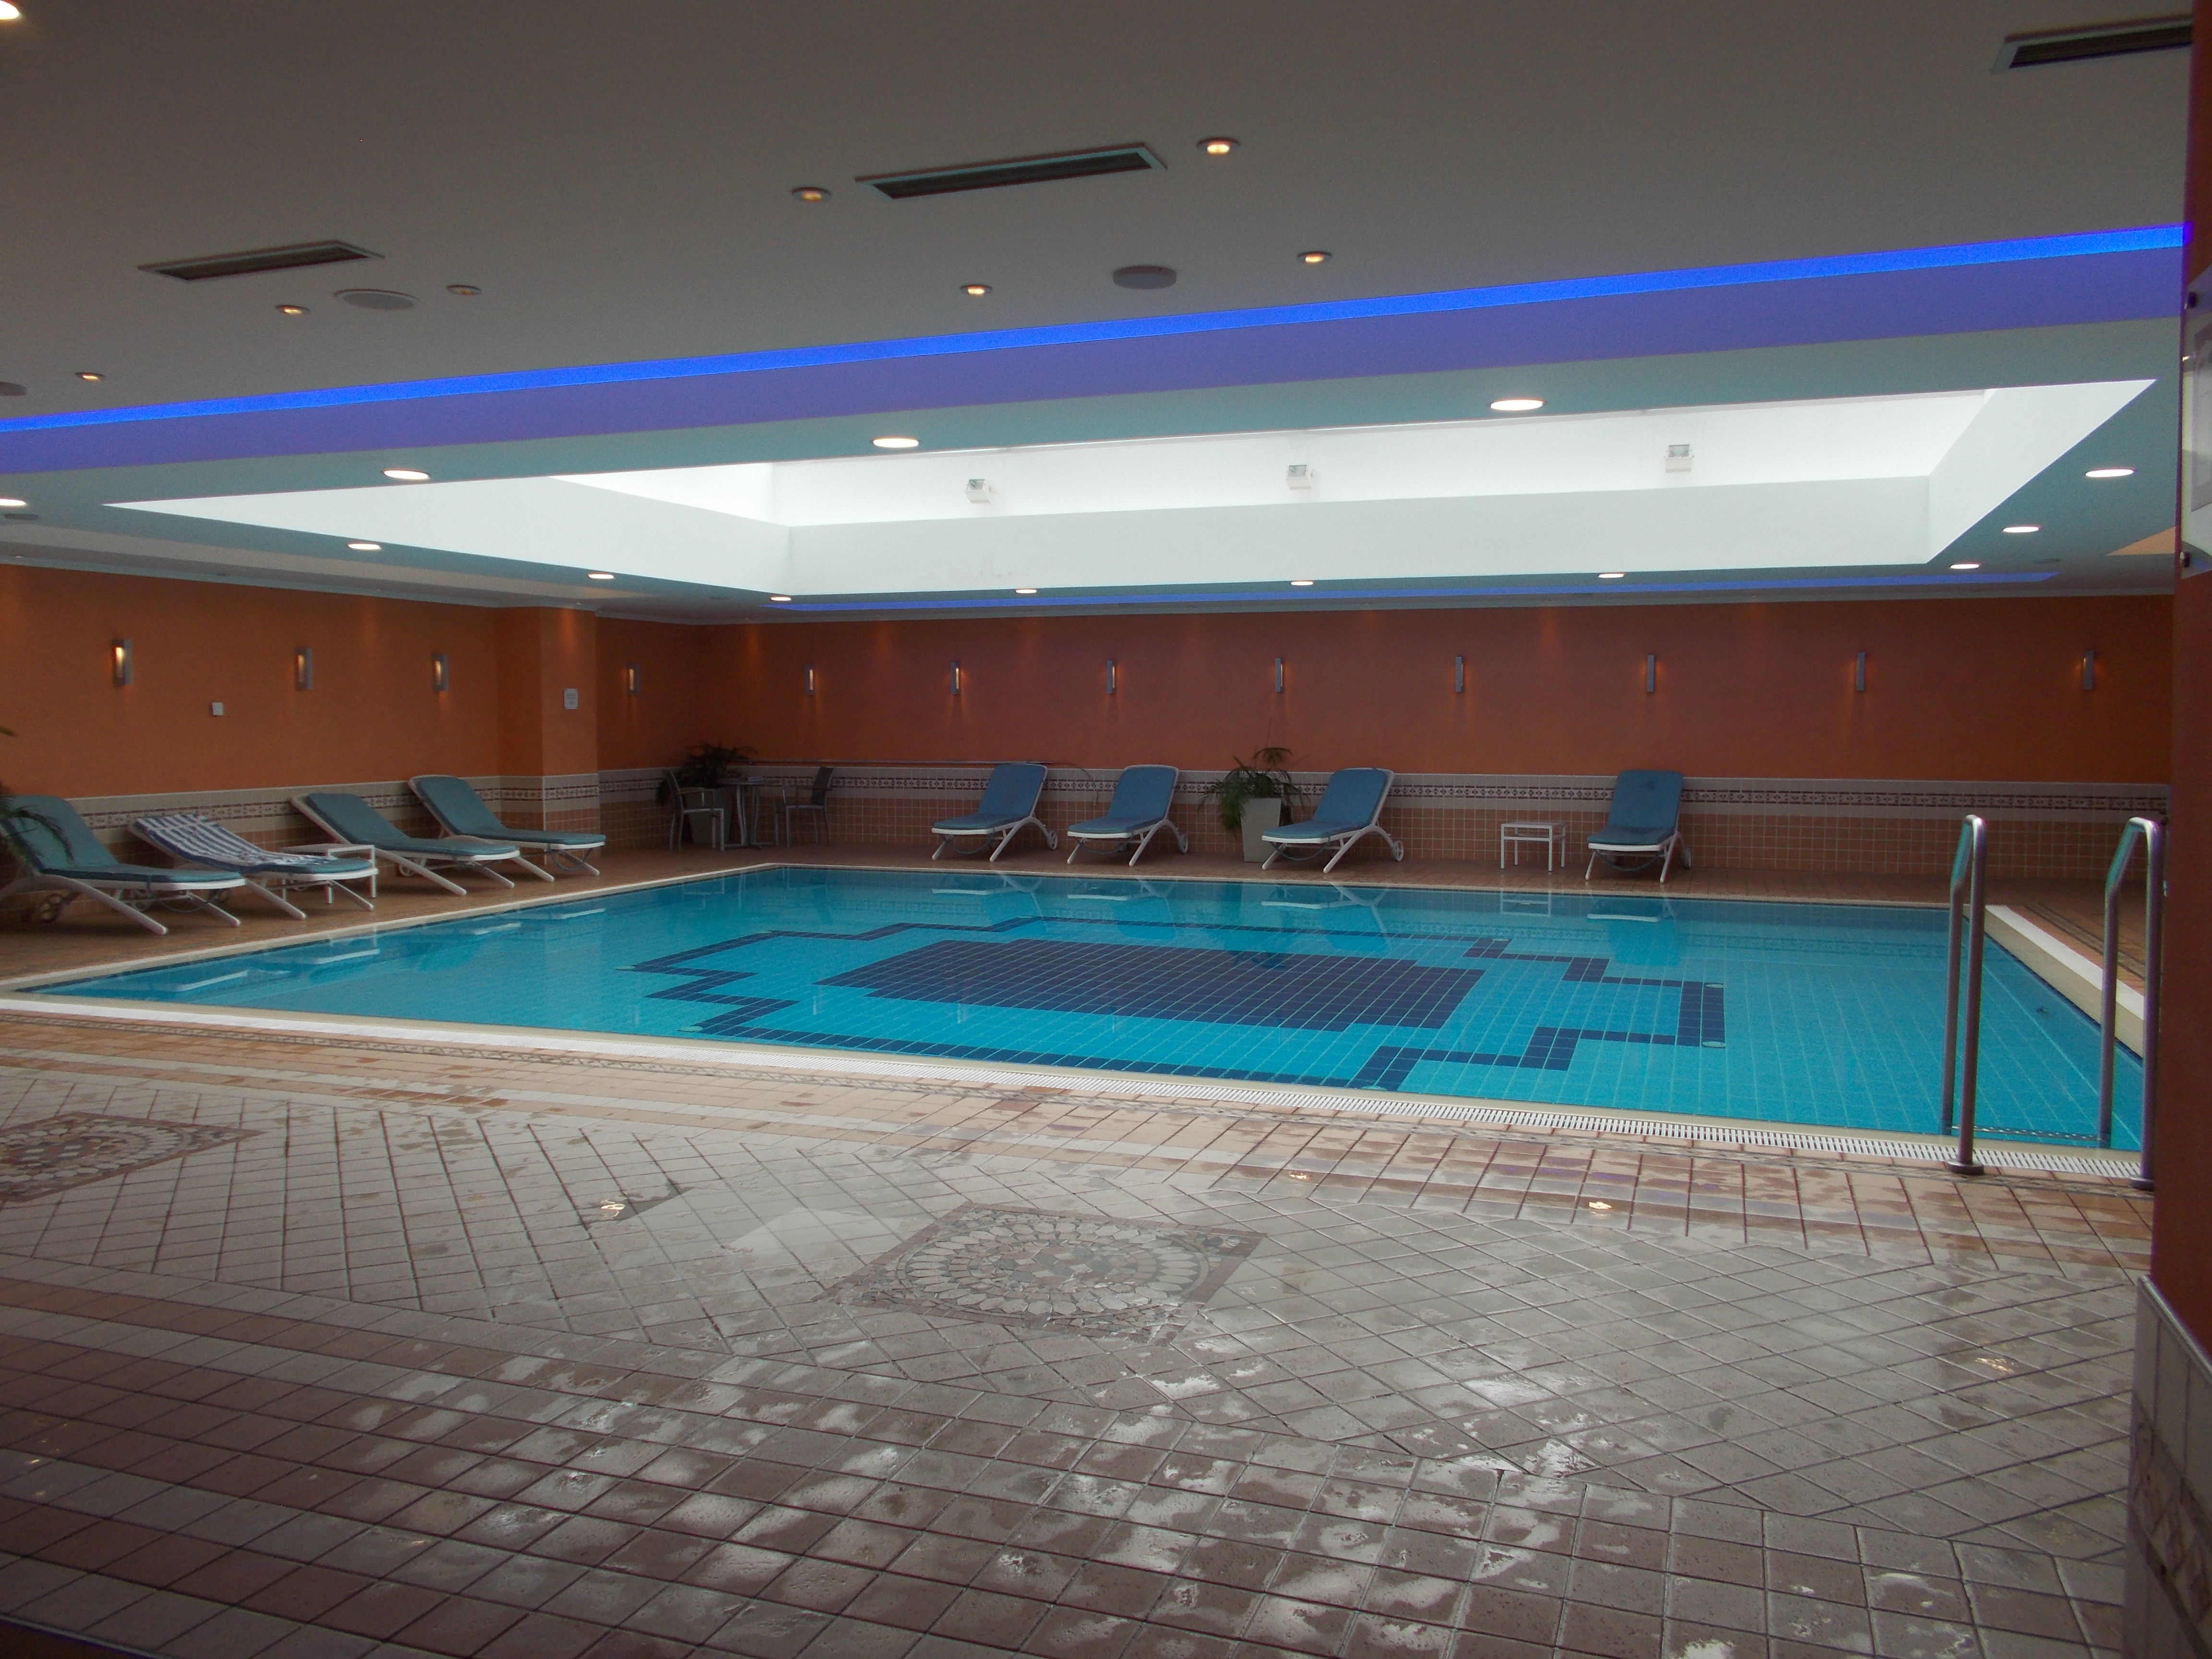 The hilton imperial dubrovnik historic dubrovnik hotel - Hilton swimming pool ...